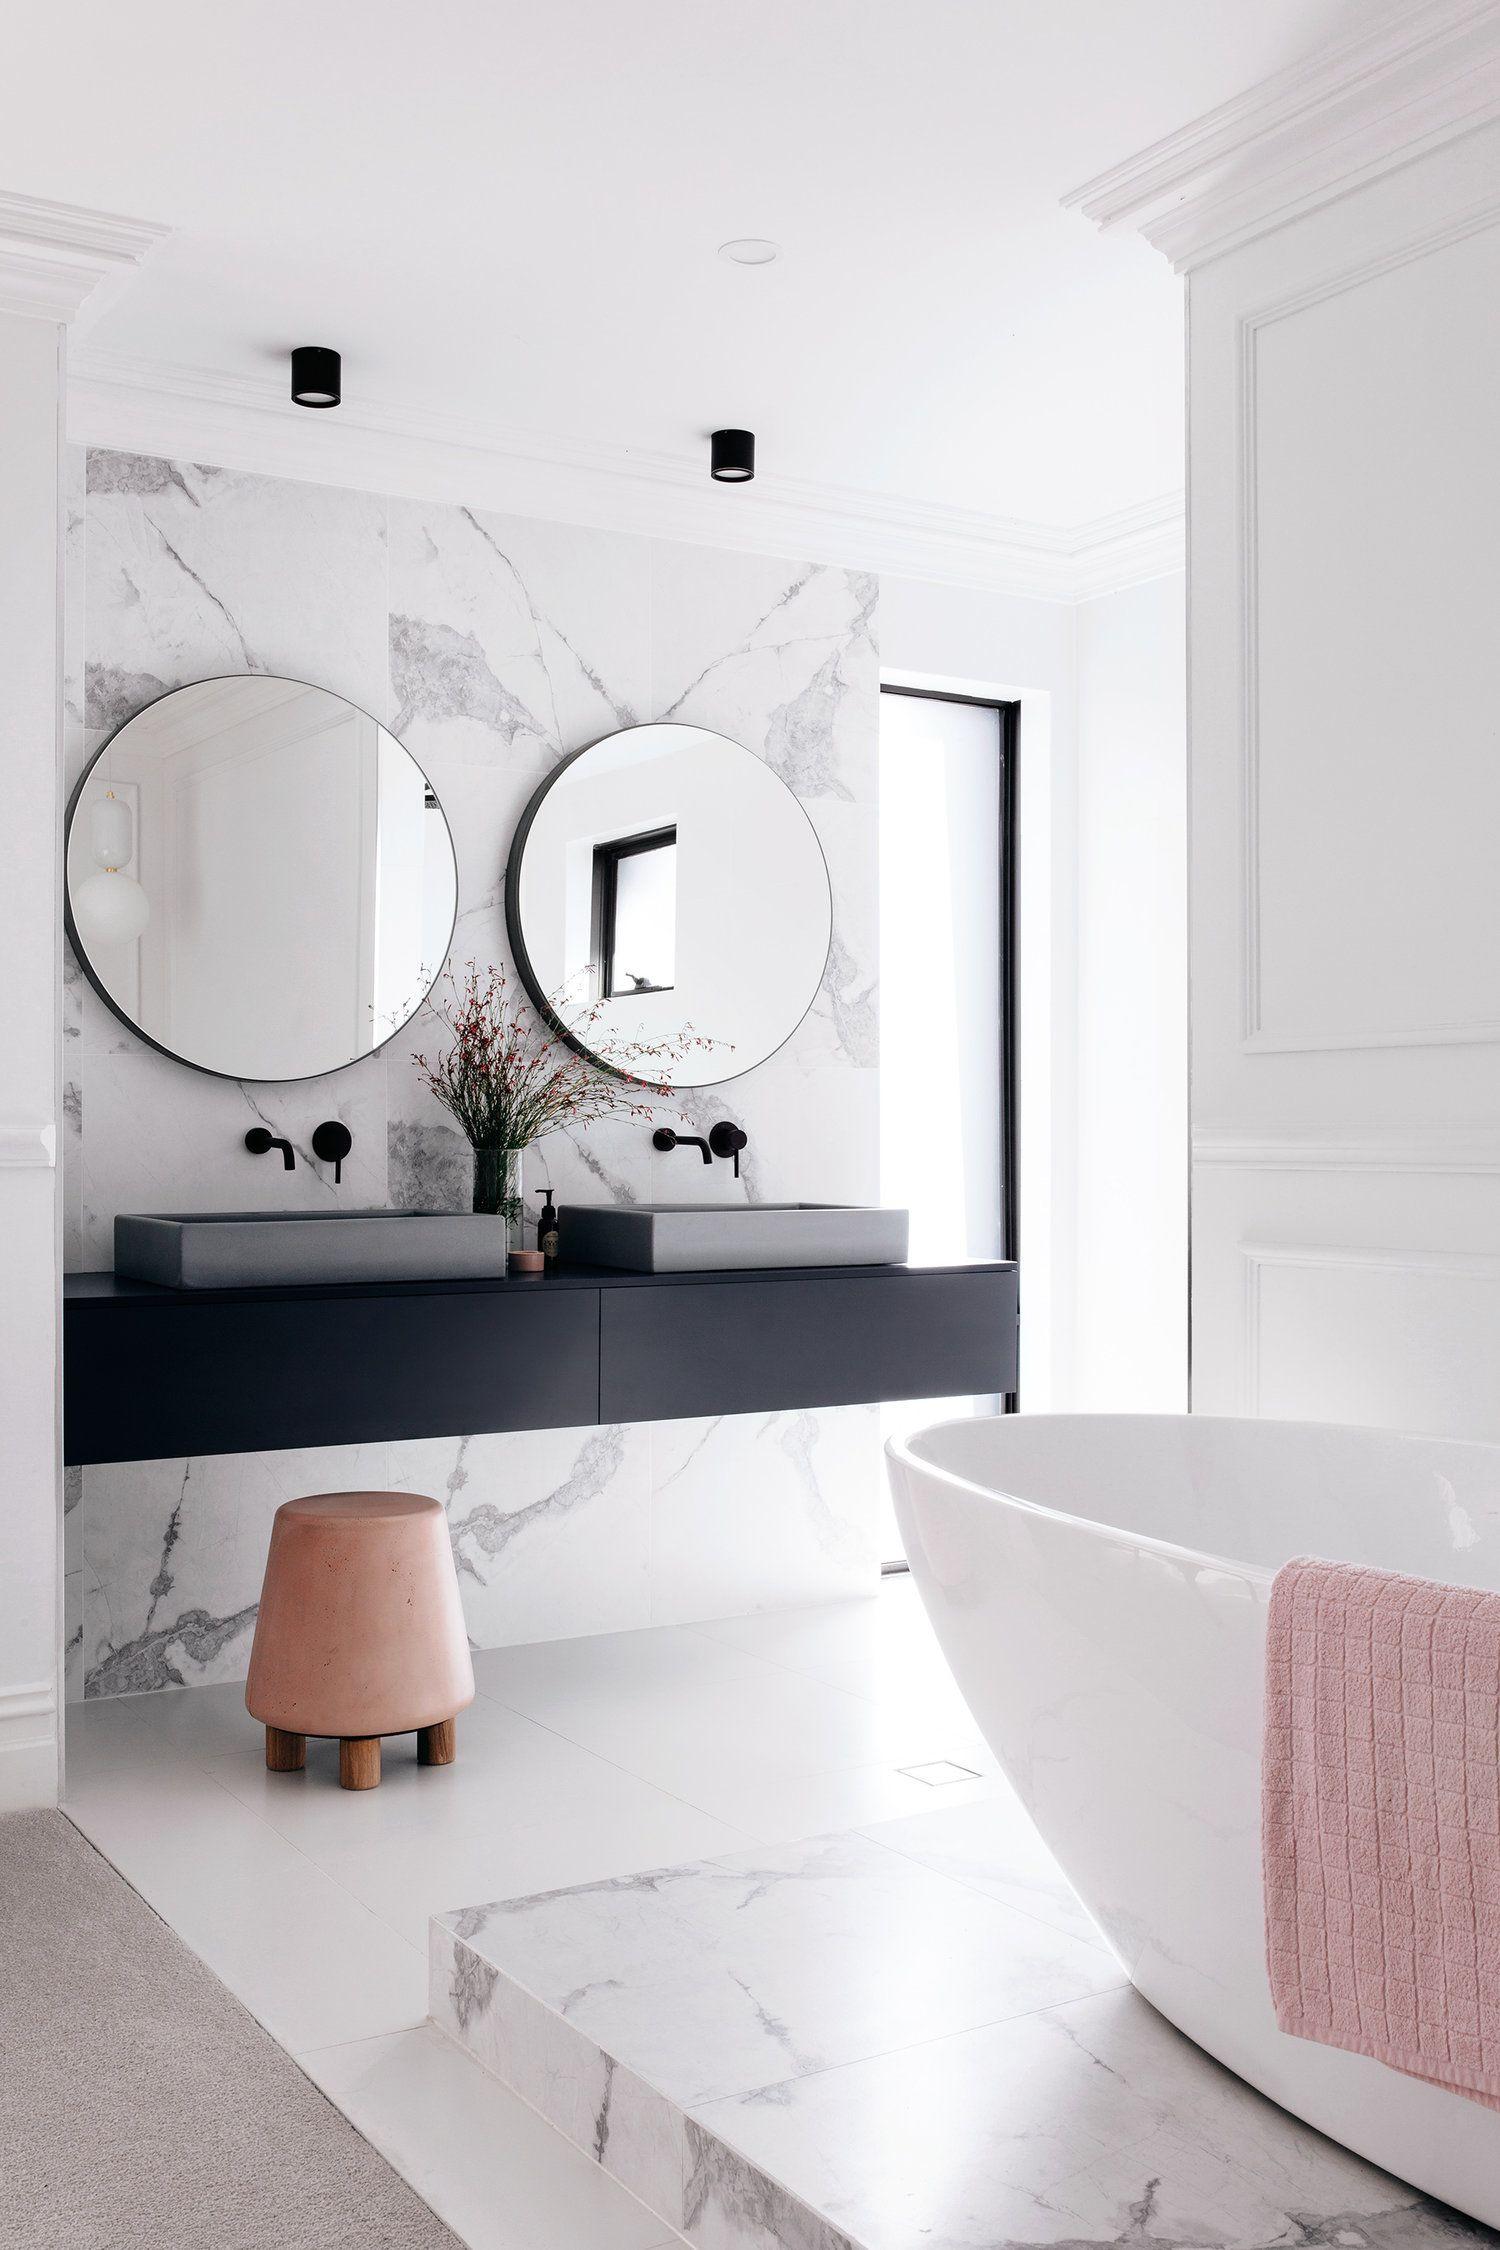 Salle De Bain Du Futur ~ 20 small bathroom sinks ideas decoraci n pinterest salle de